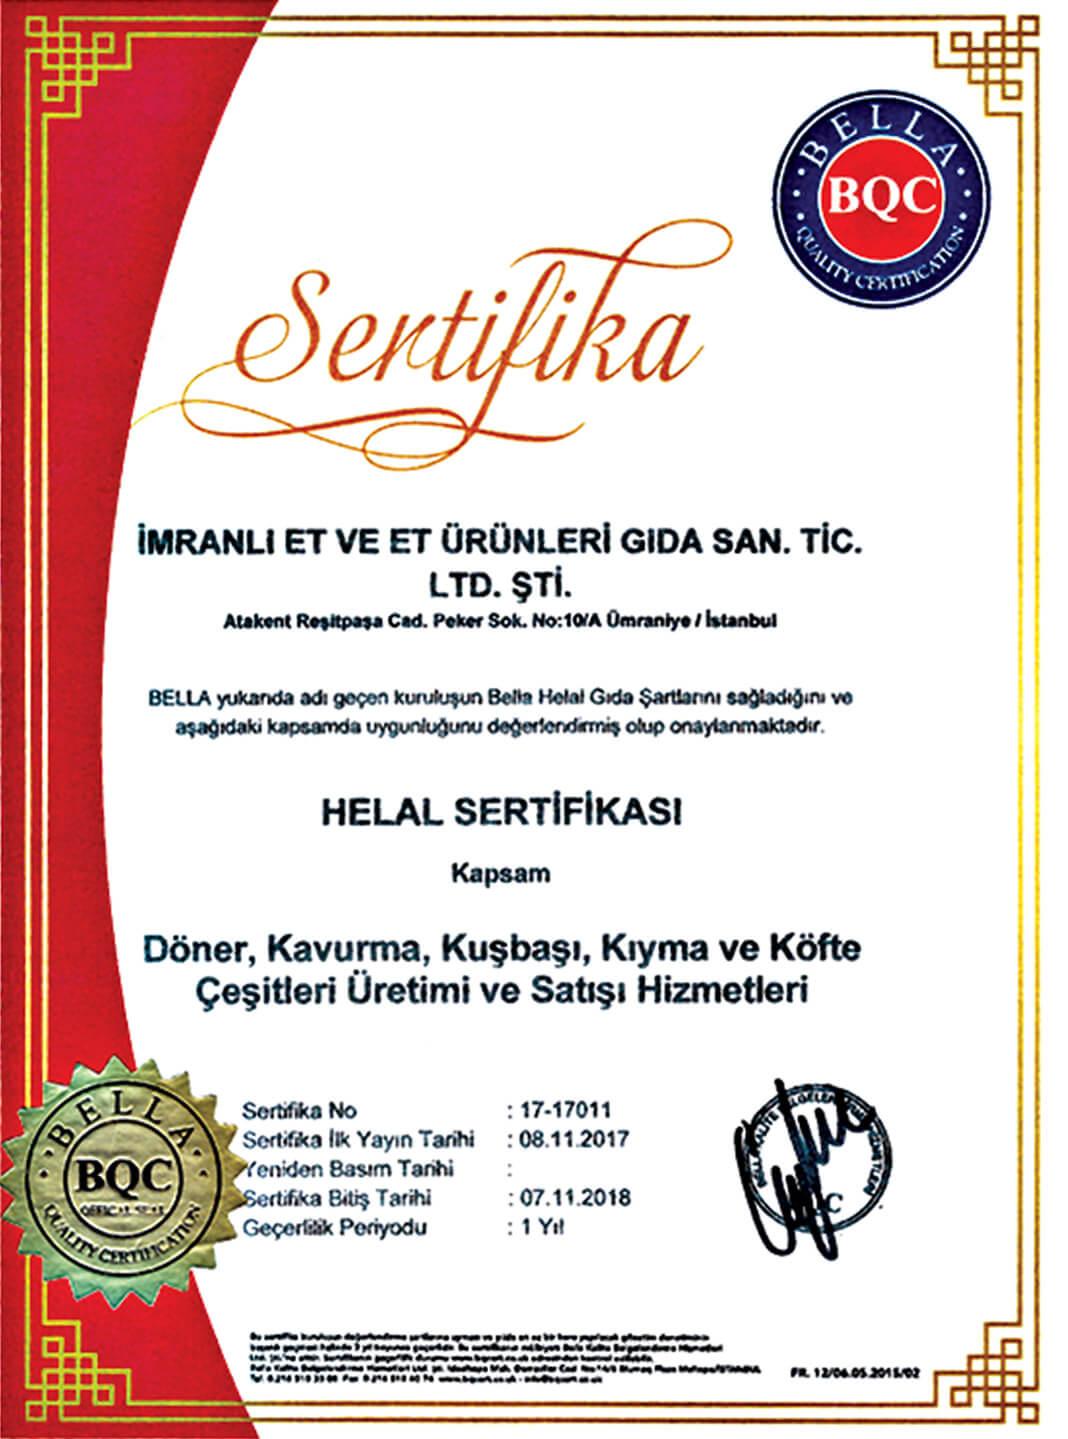 doerci_celal_usta_helal_sertifikasi_01